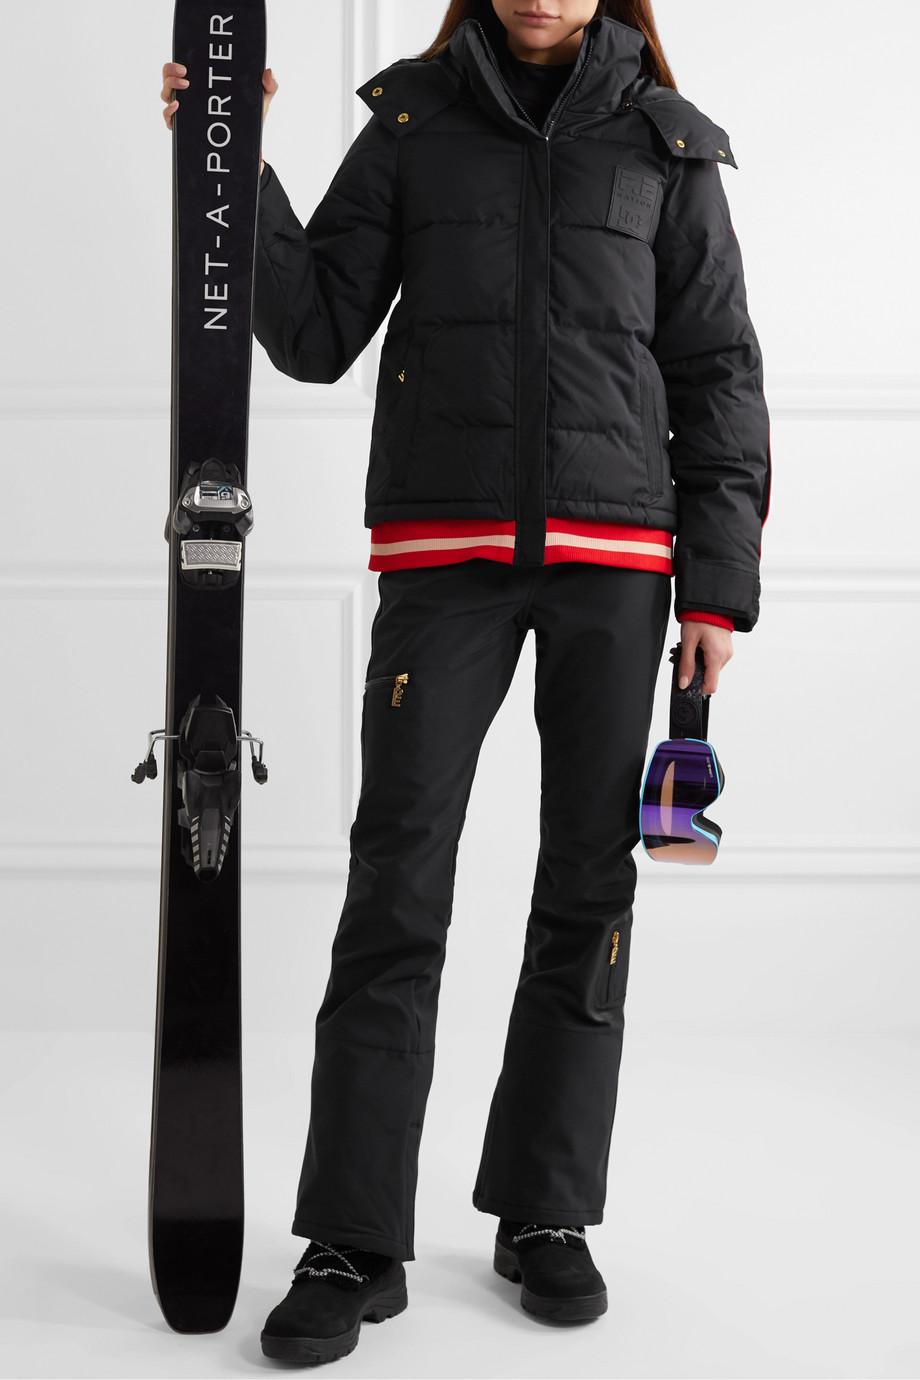 P.E NATION + DC stretch flared ski pants